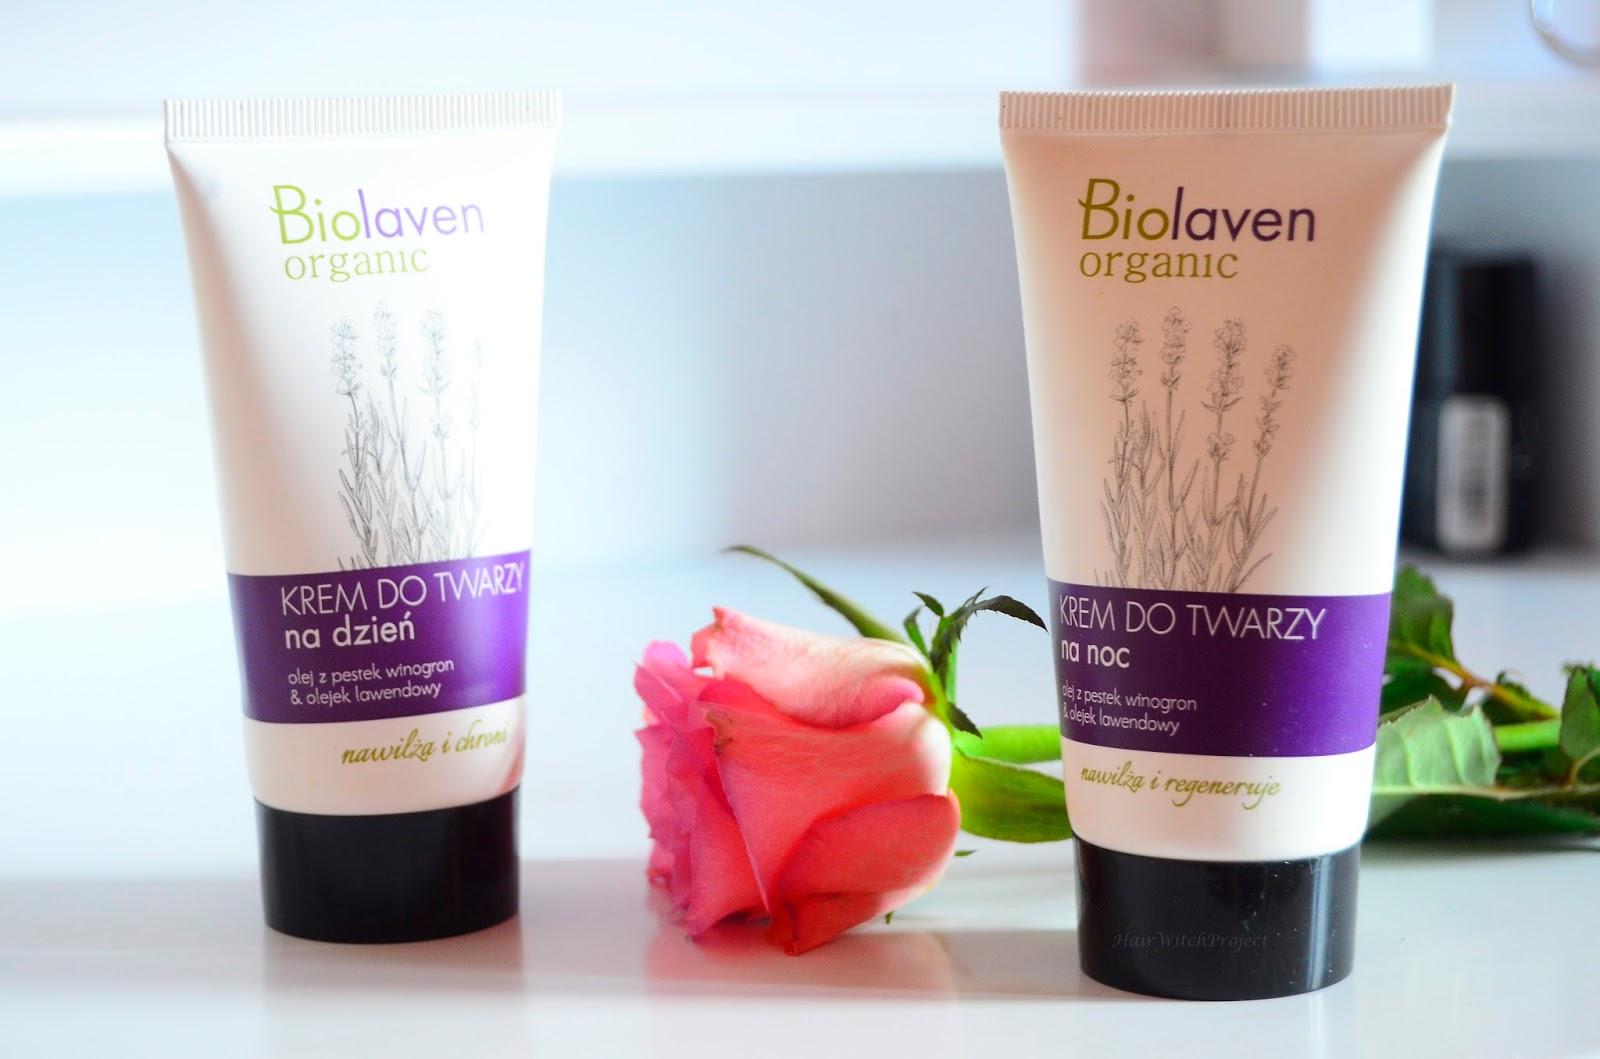 kremy | Biolaven | natural | naturalna pielęgnacja | pielęgnacja cery | kosmetyki naturalne